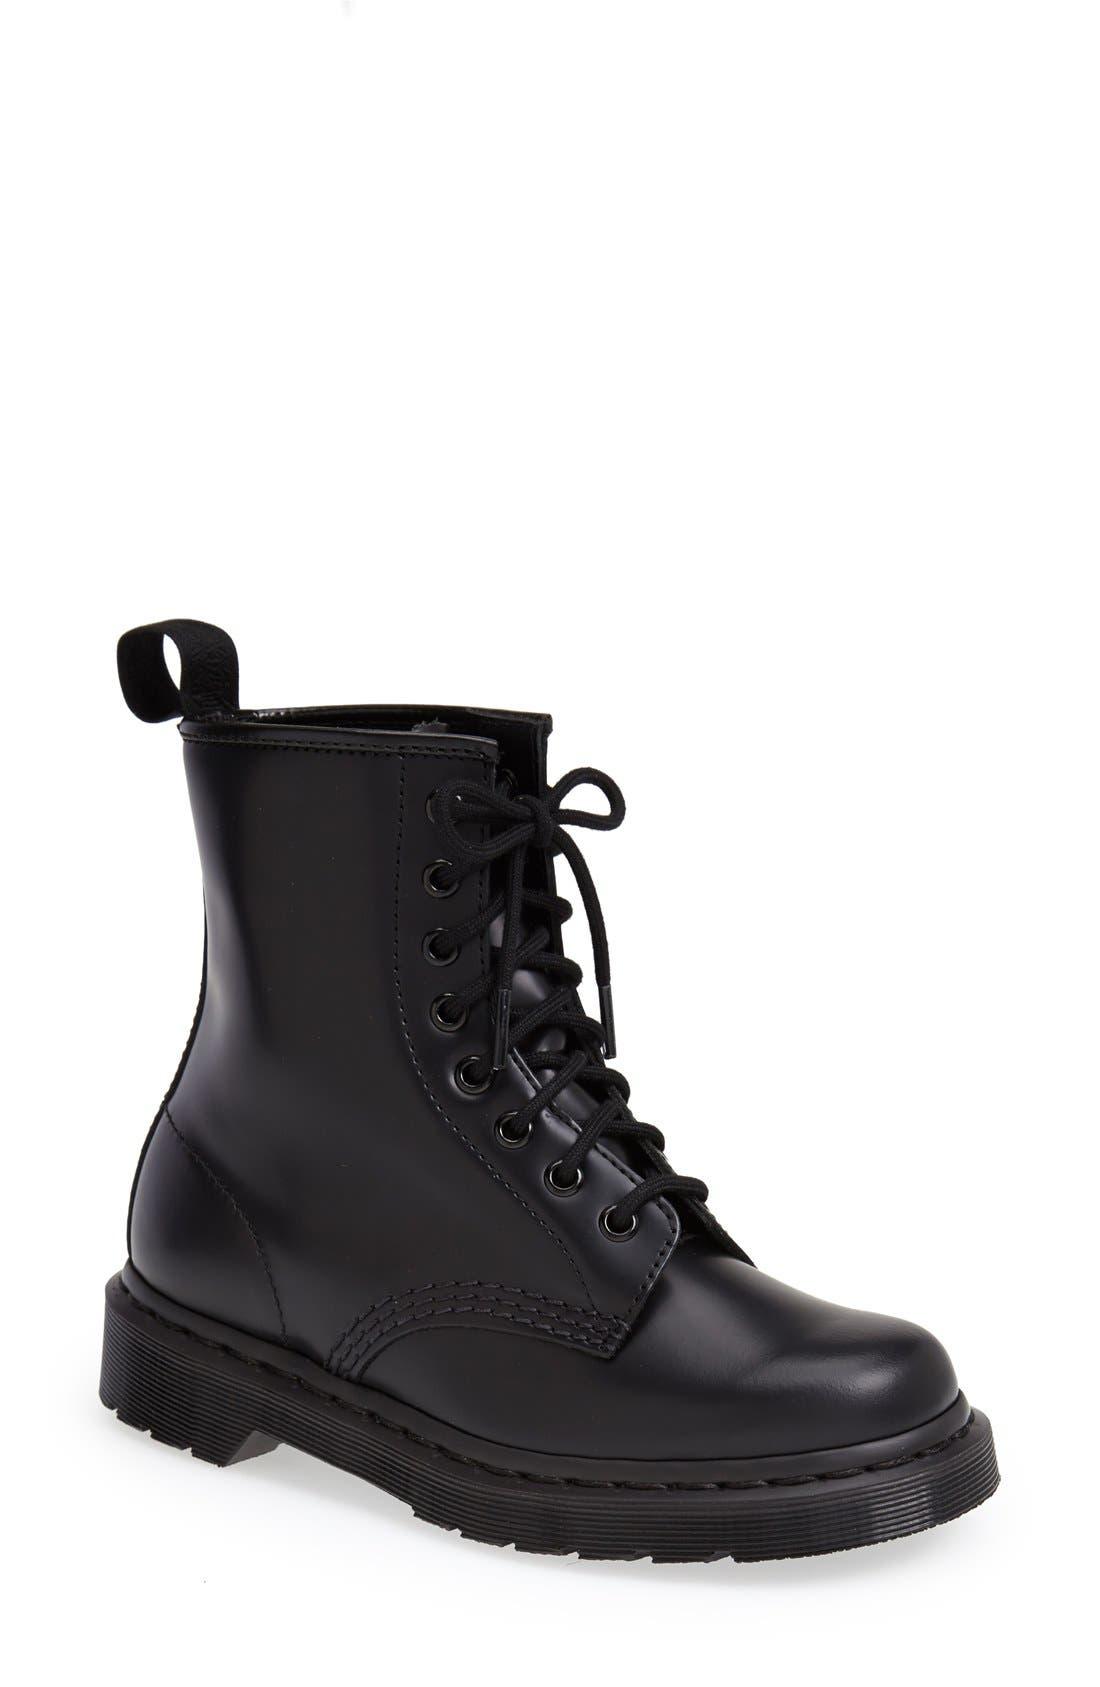 Alternate Image 1 Selected - Dr. Martens '1460 Mono' Boot (Women)